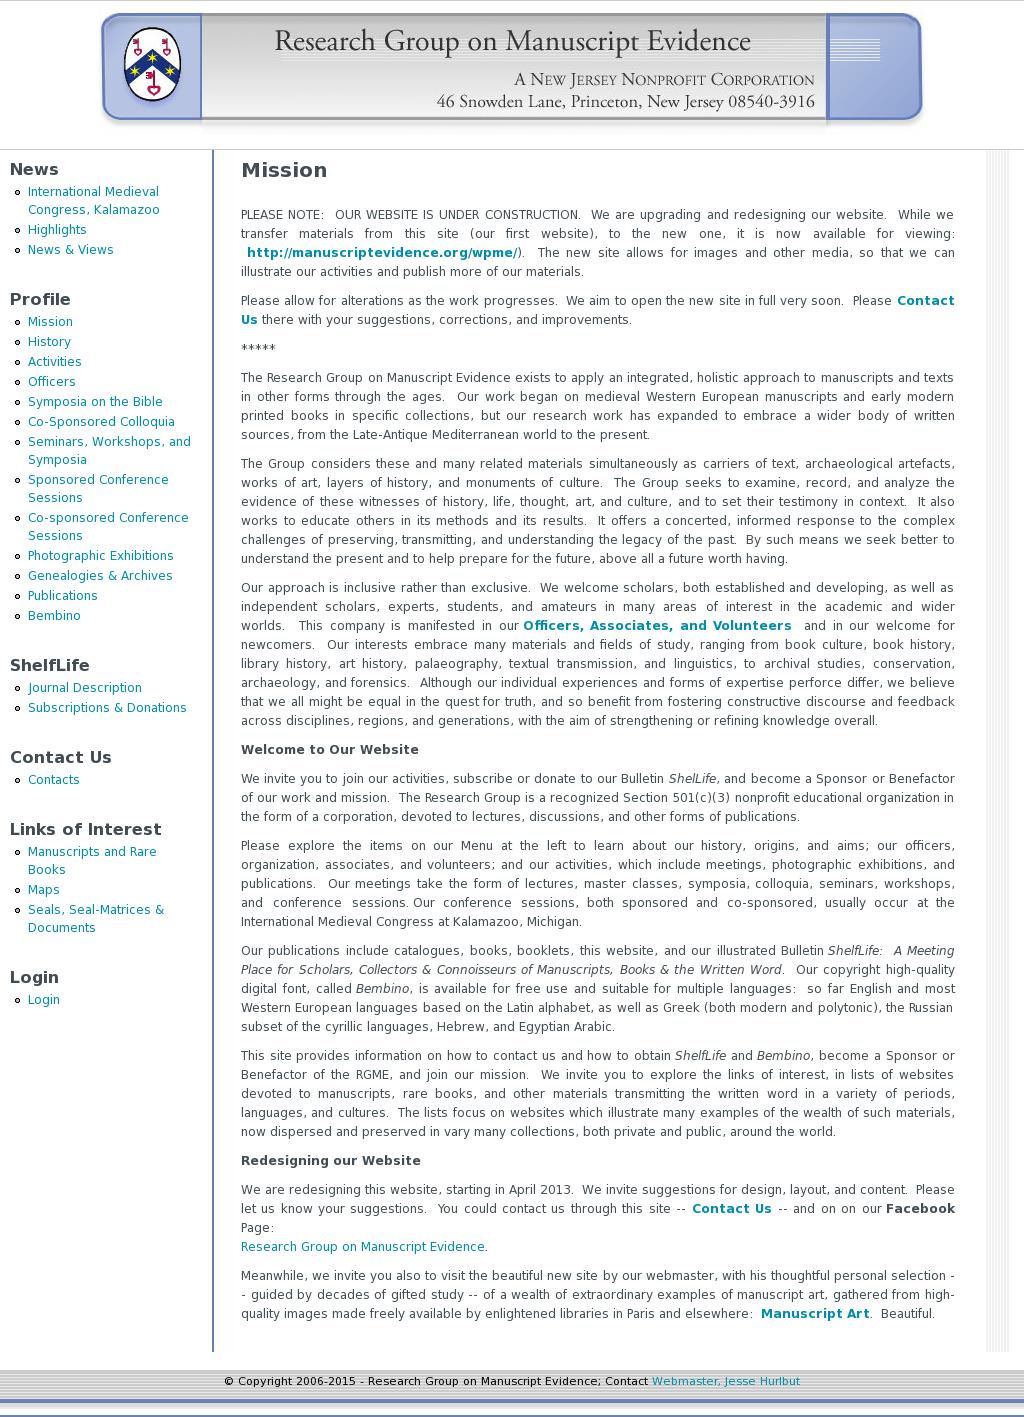 Research Group On Manuscript Evidence Competitors, Revenue